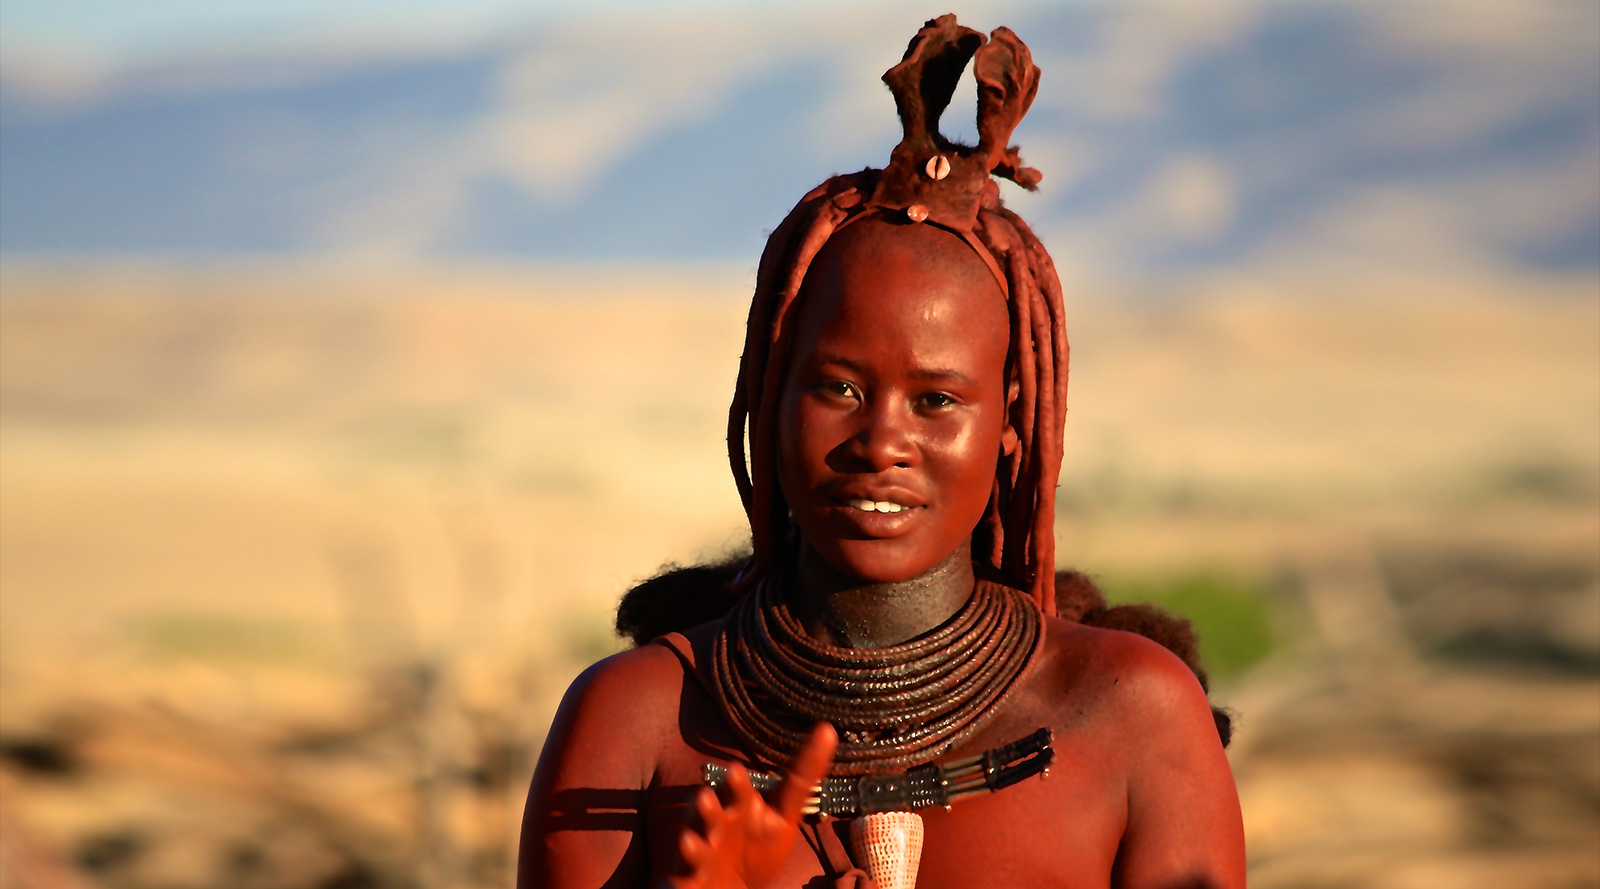 © Benedetta Mazzini | Himba